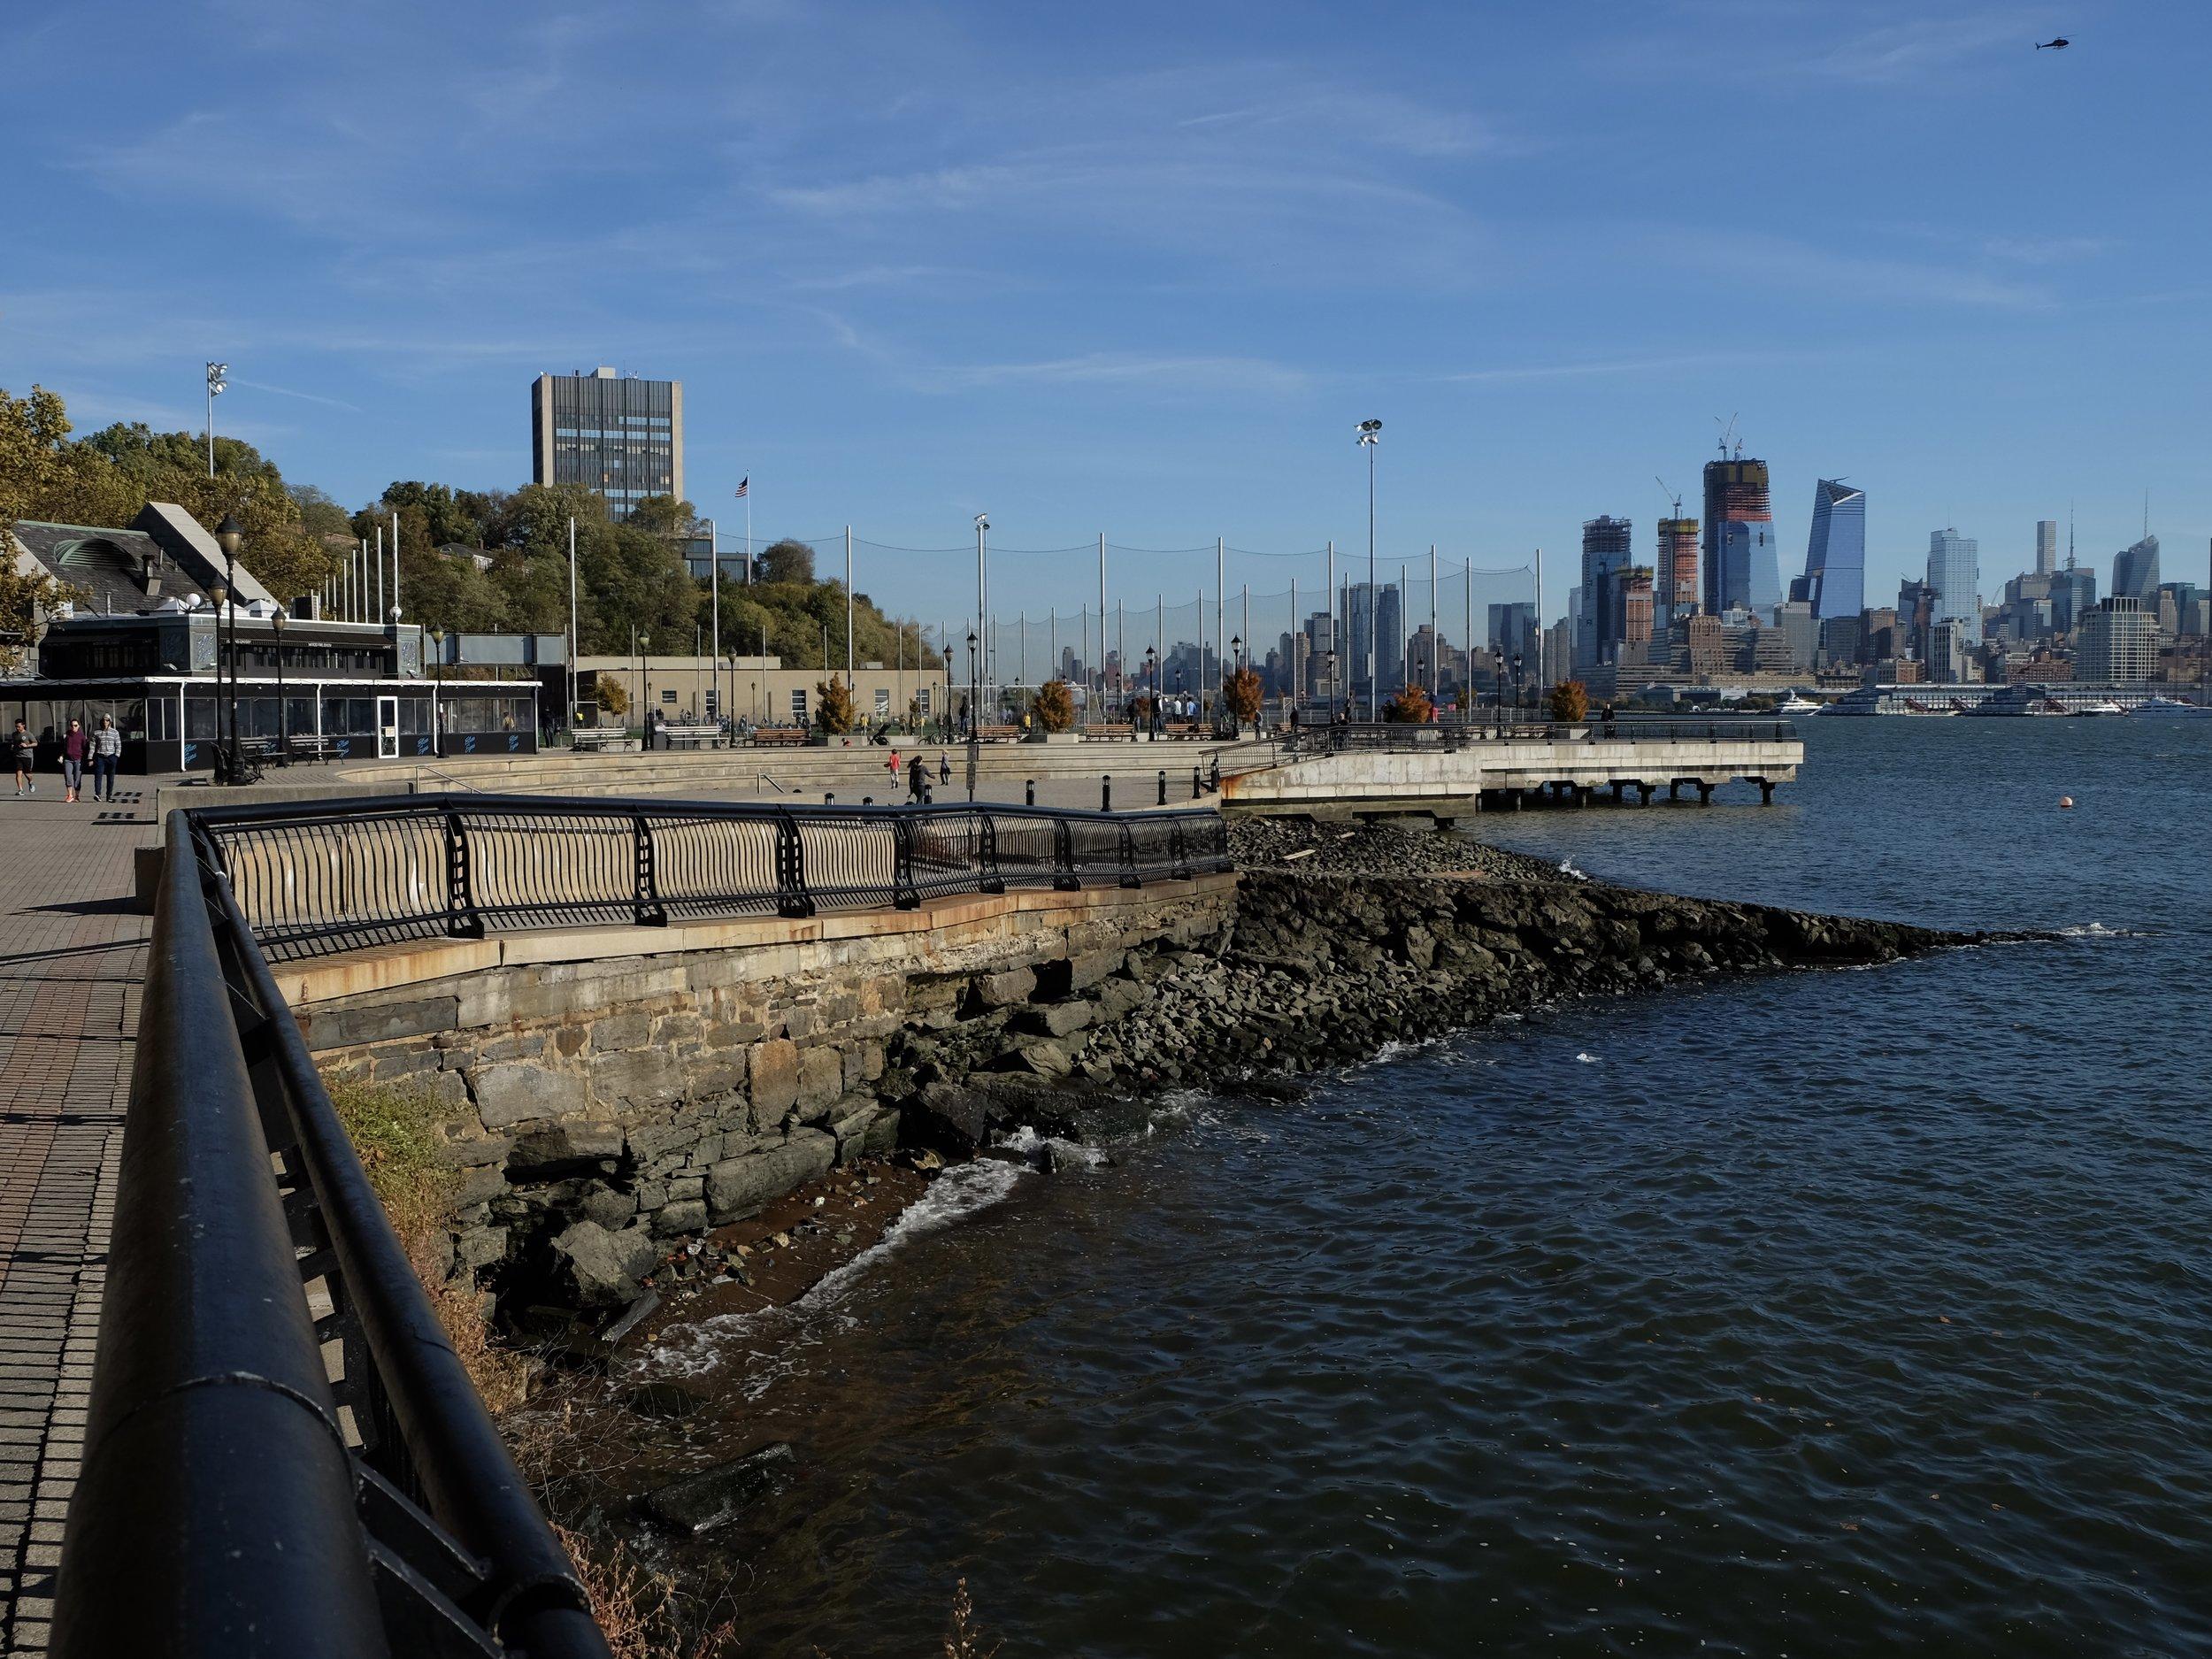 Hoboken - Sinatra Park